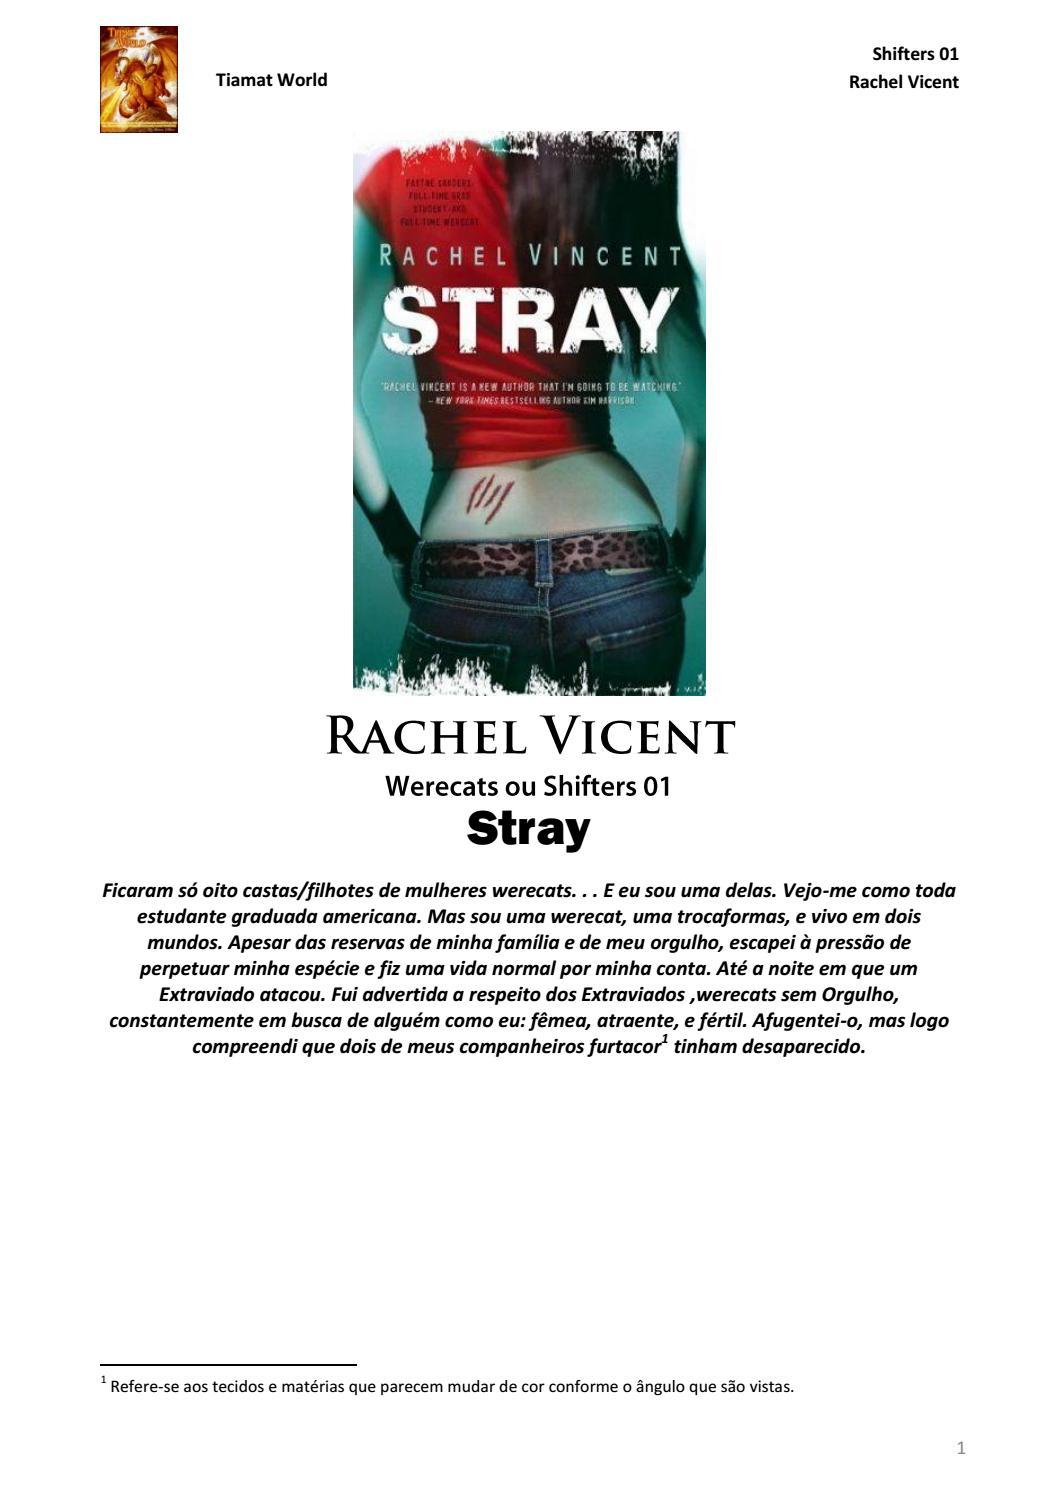 Stray - Shifters (Werecats) 01 - Rachel Vincent by Fruitpip - issuu 60fd951e9e